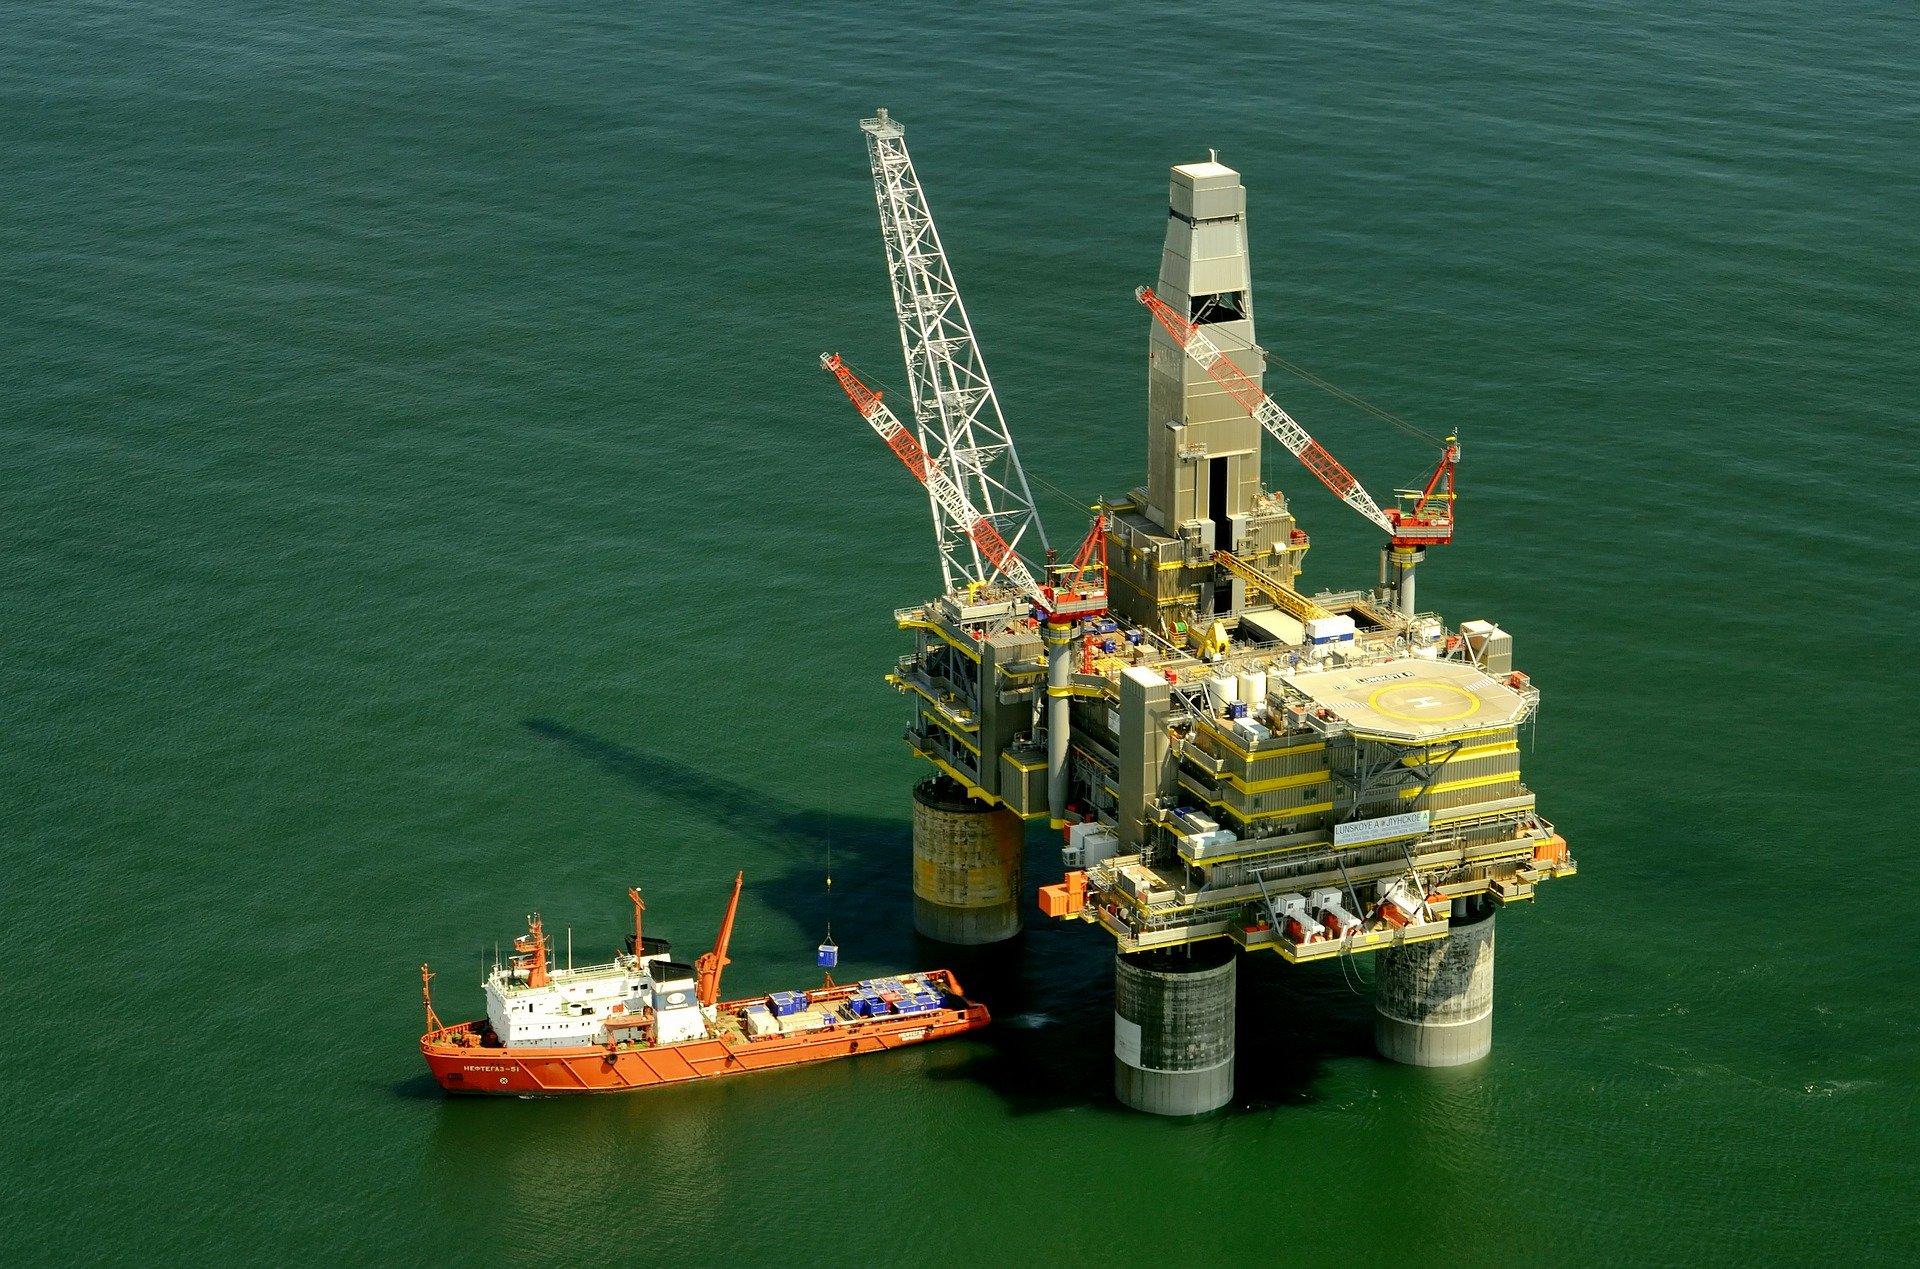 State authorities must take responsibility for 2011 Kolskaya oil rig disaster